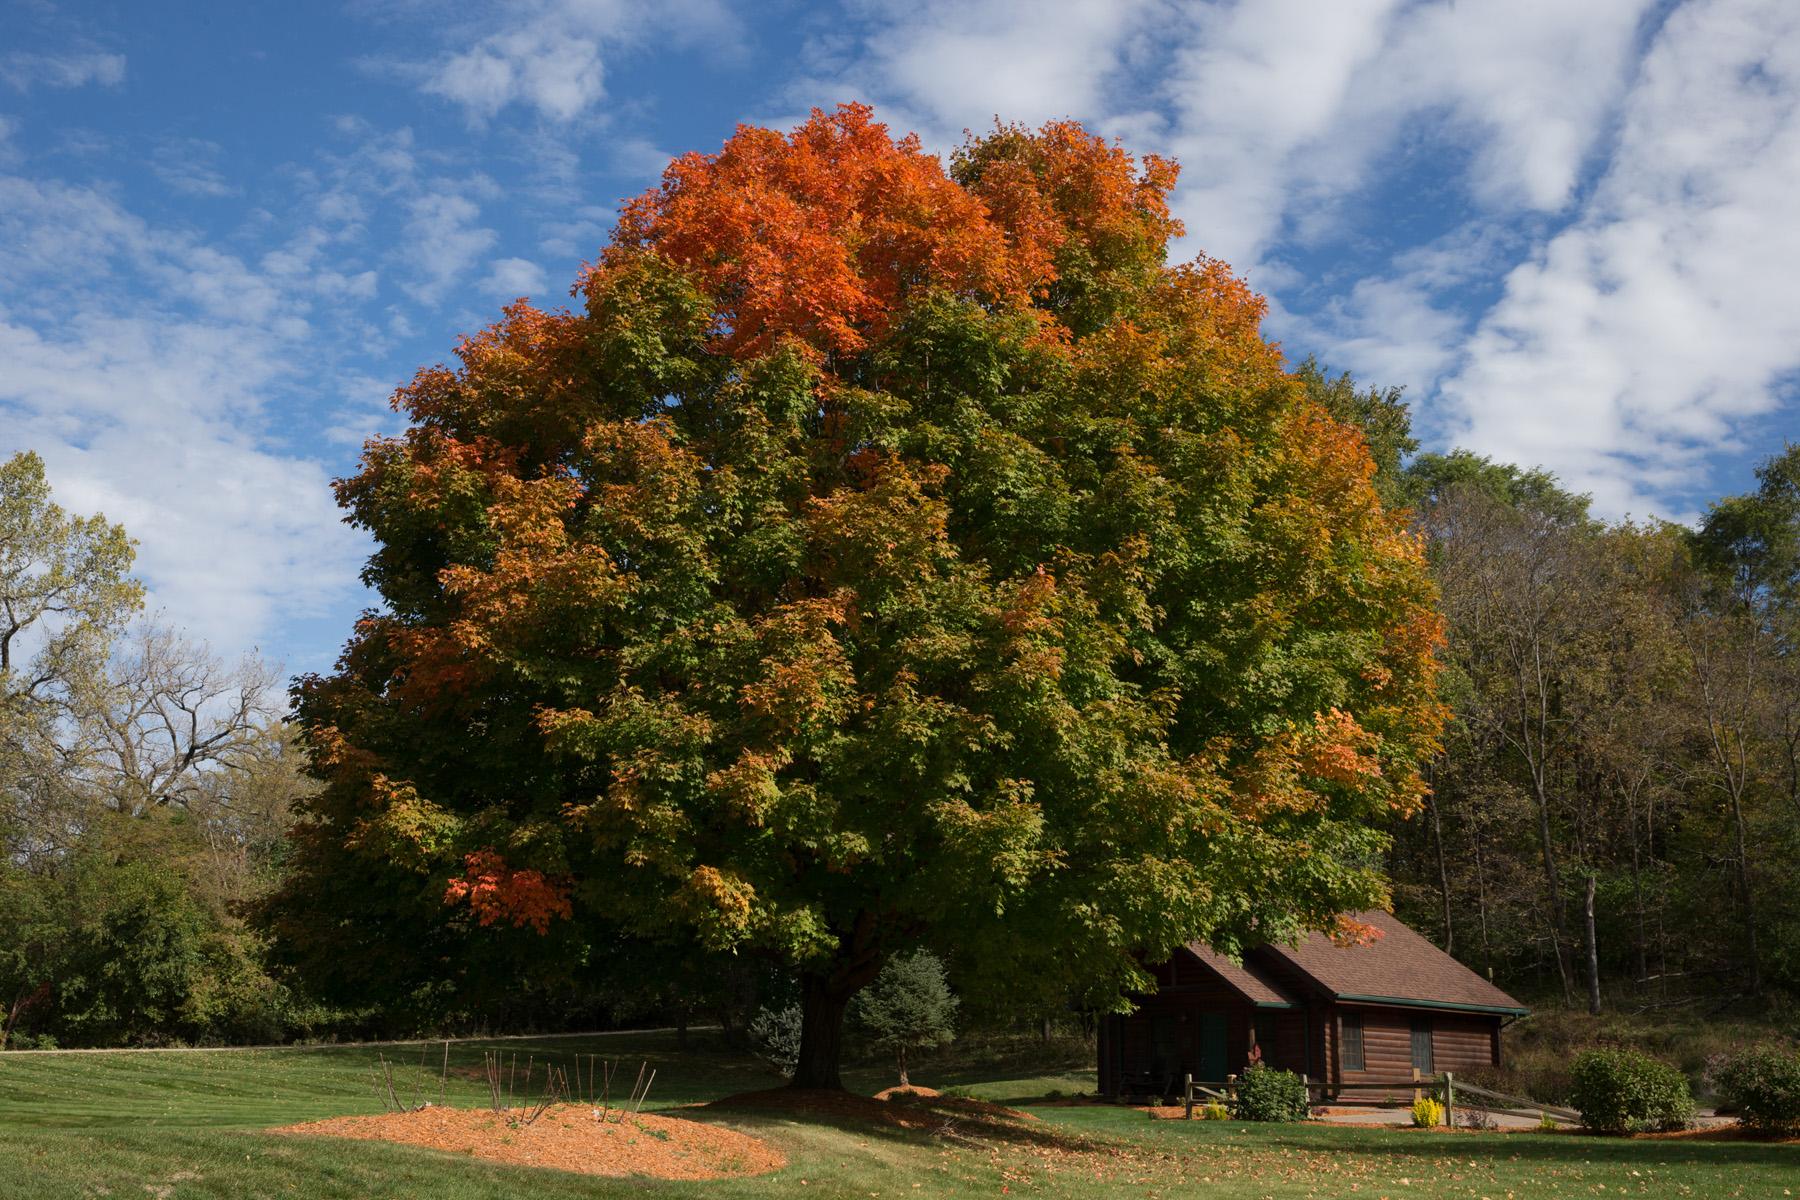 Tree by cabins - Birgit Radin